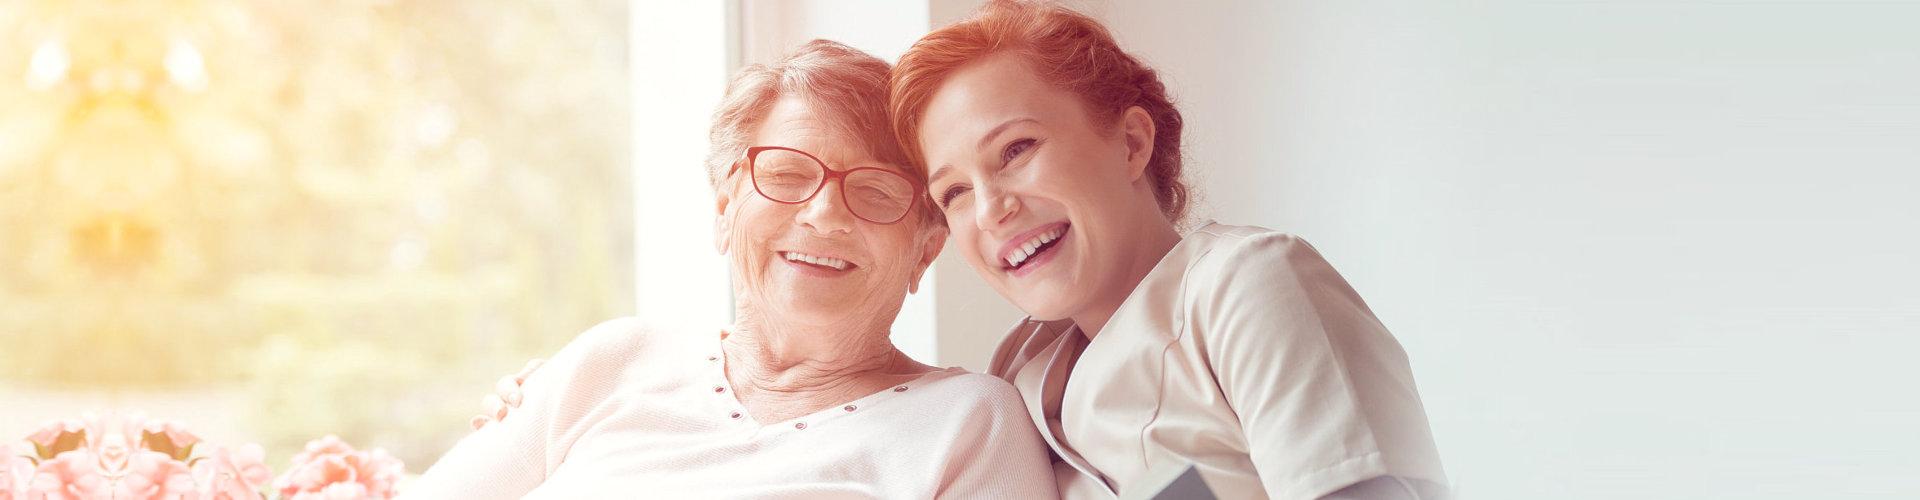 happy caregiver and senior woman